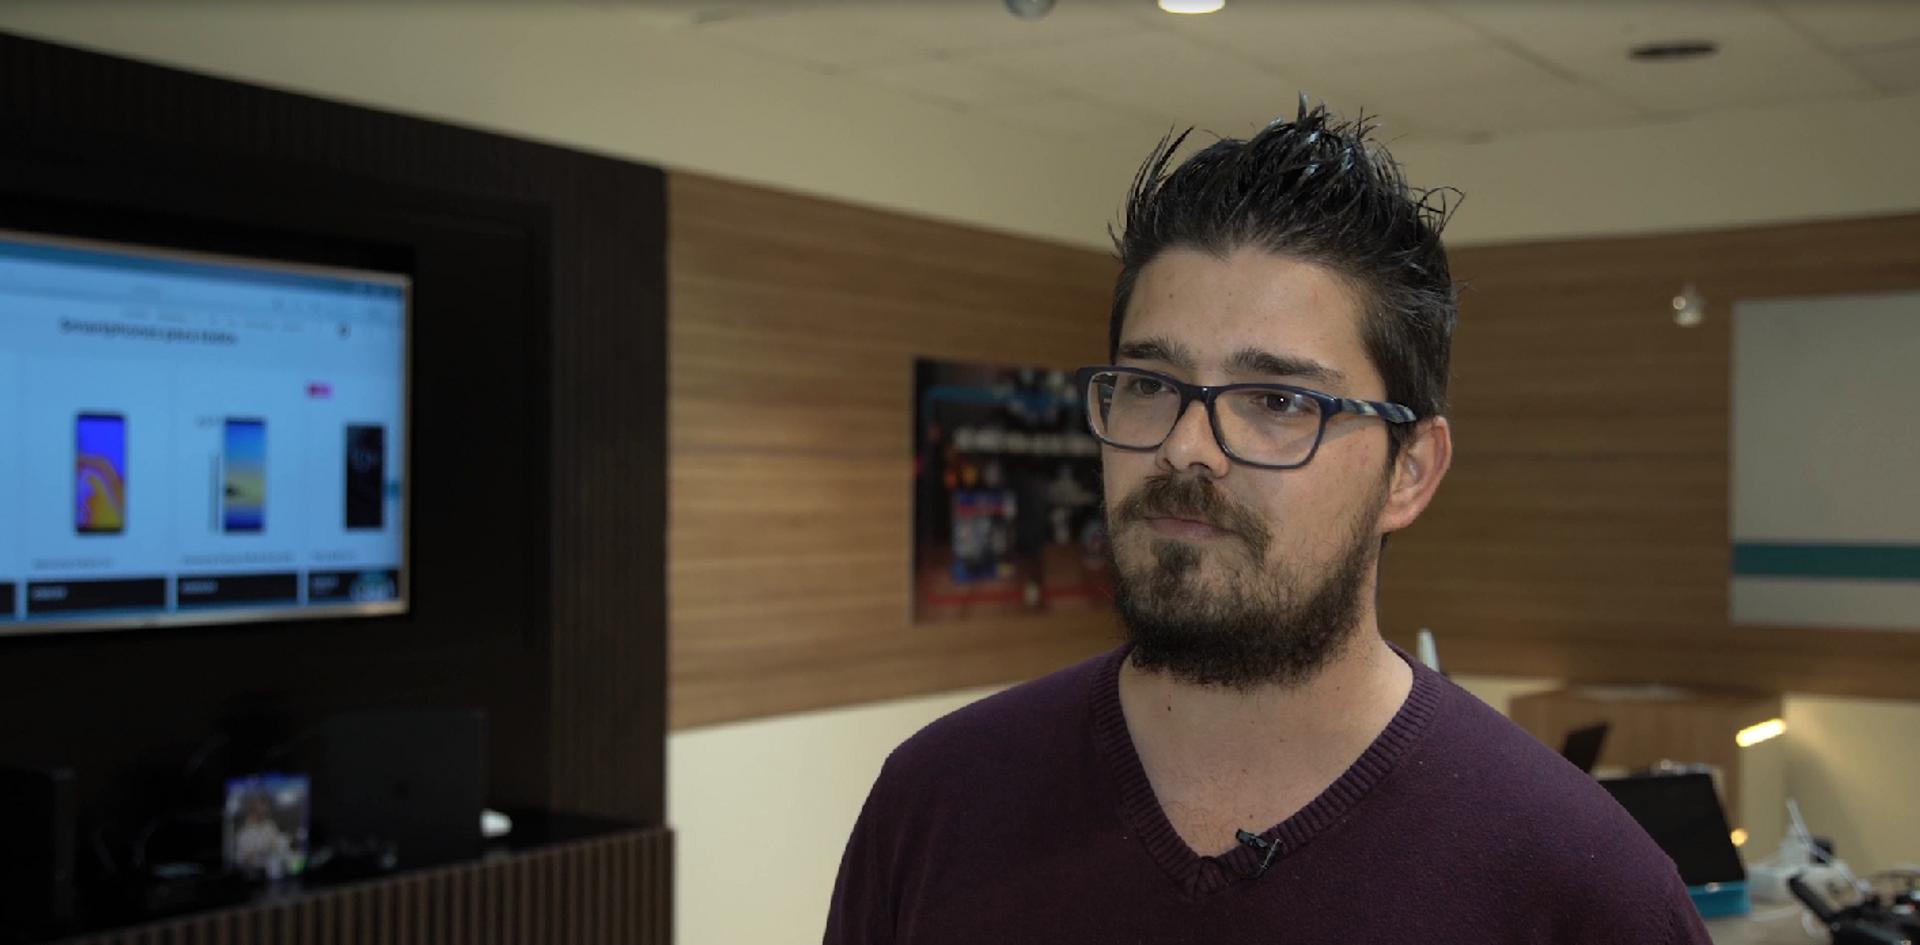 Testemunho Meo Video Chat - João